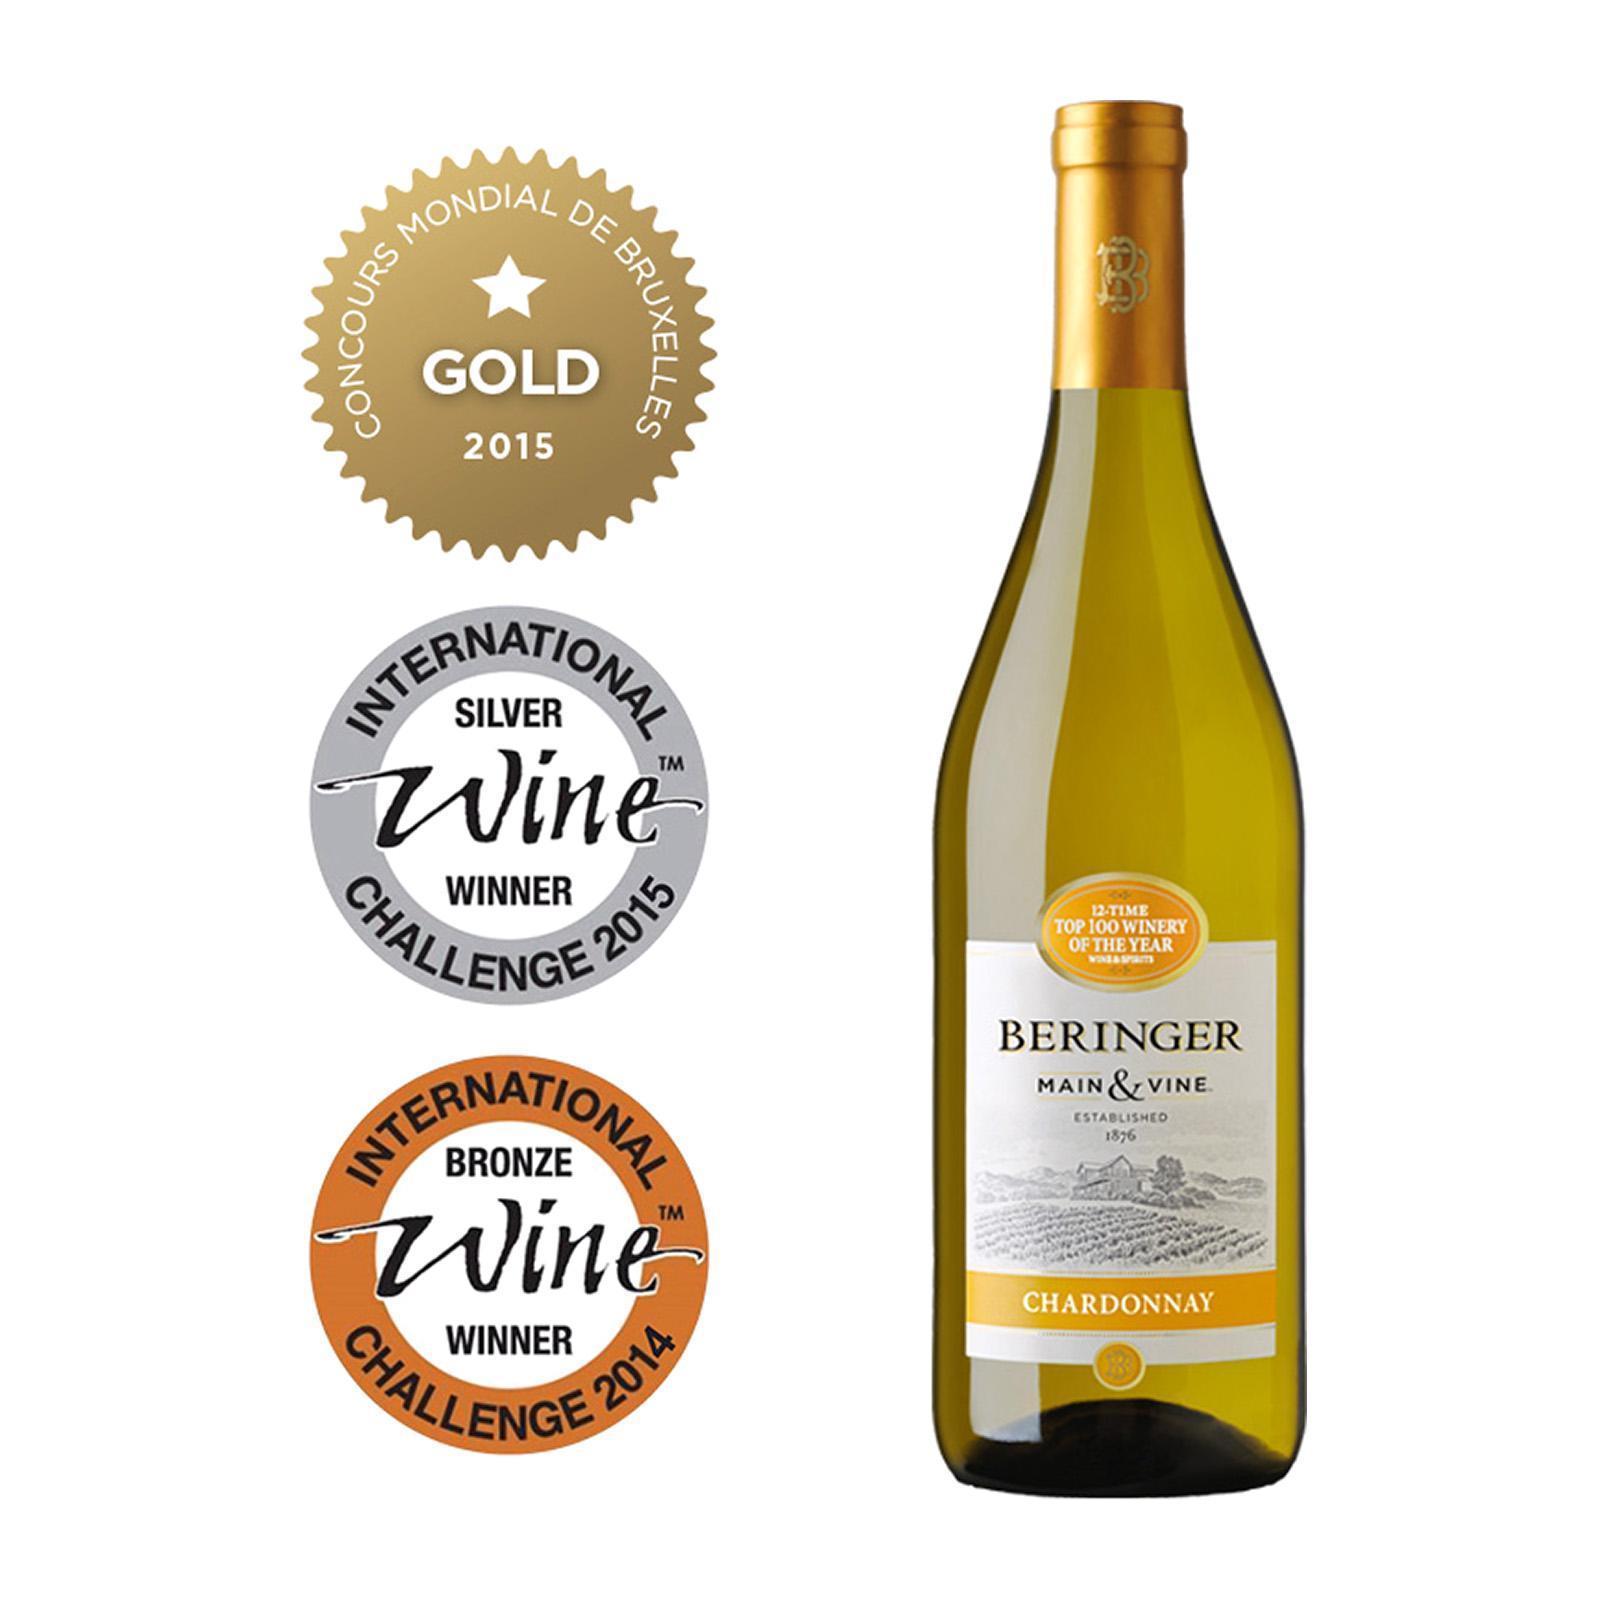 Beringer Main And Vine Chardonnay Peach Flavour